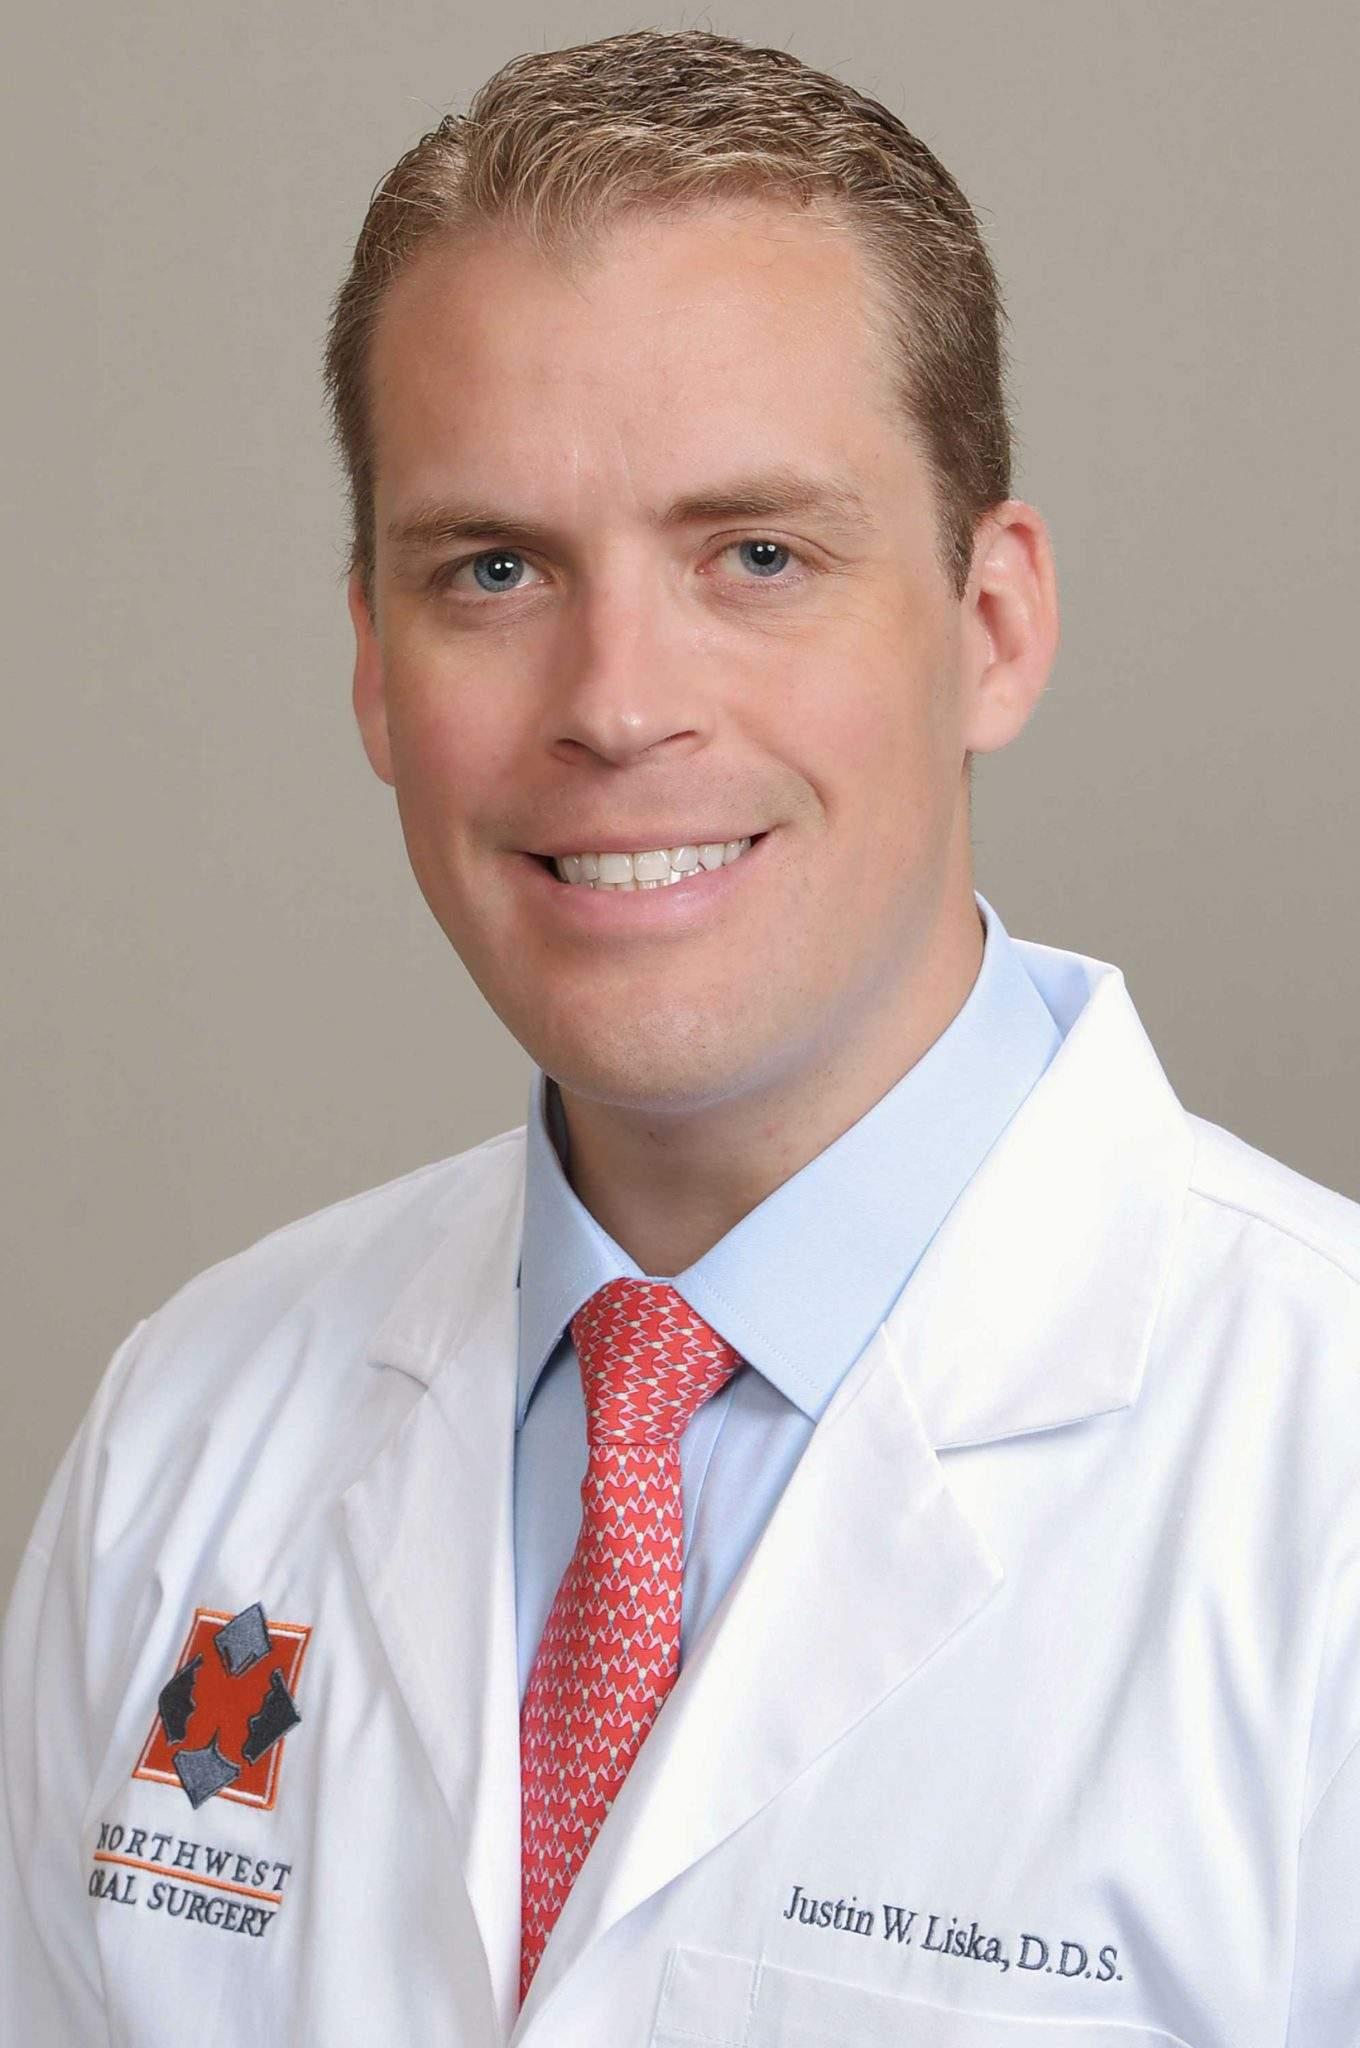 Dr. Liska -Northwest Oral & Maxillofacial Surgery